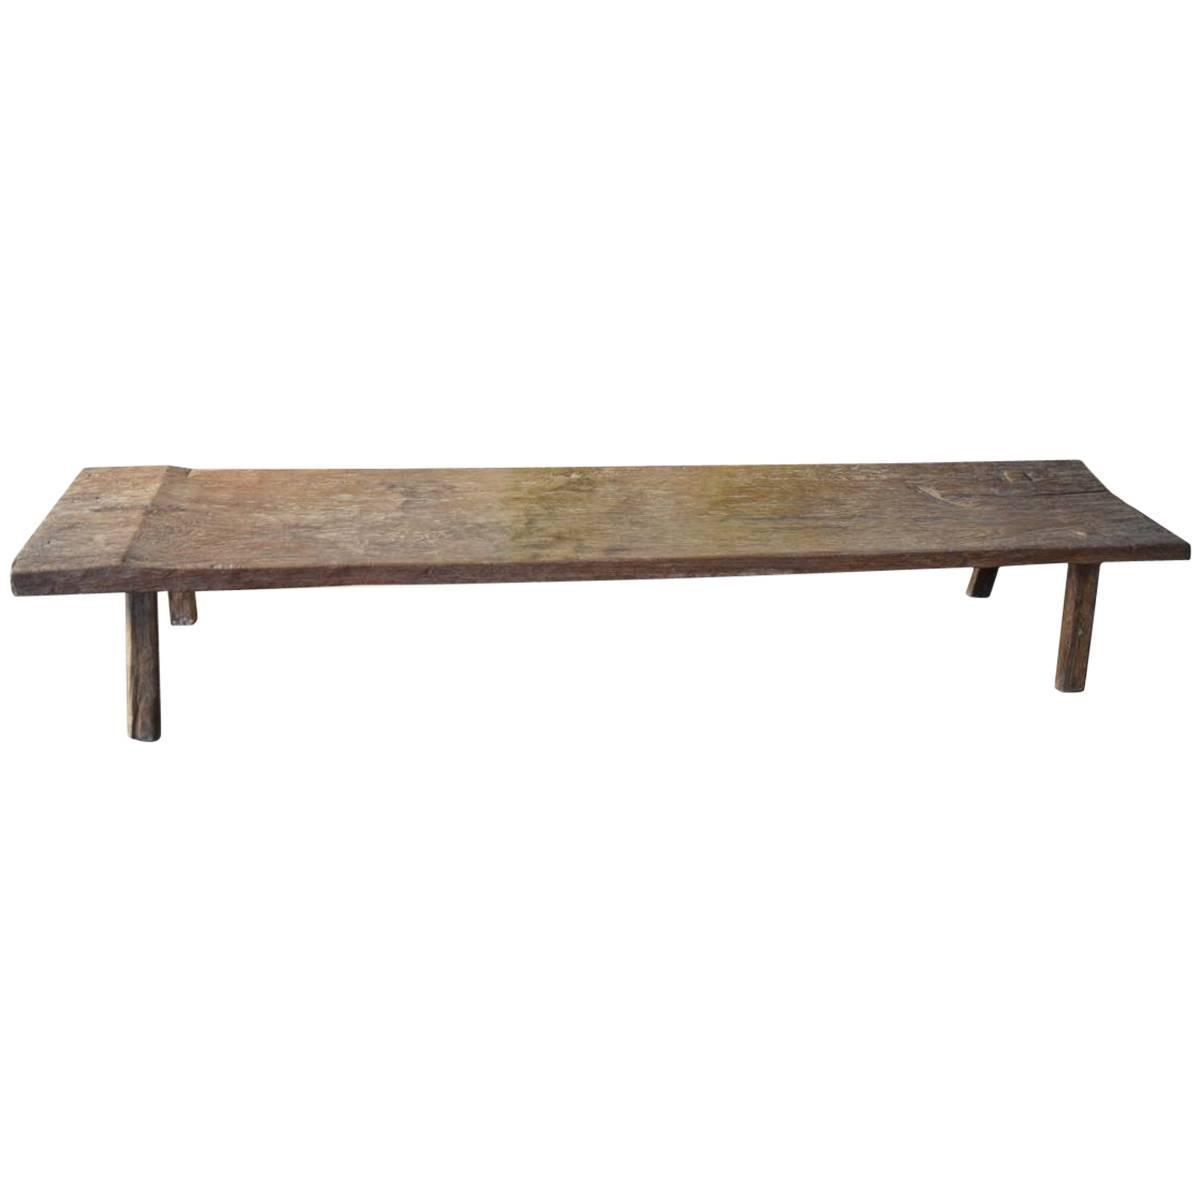 Wabi-Sabi Bench Or Coffee Table At 1stdibs